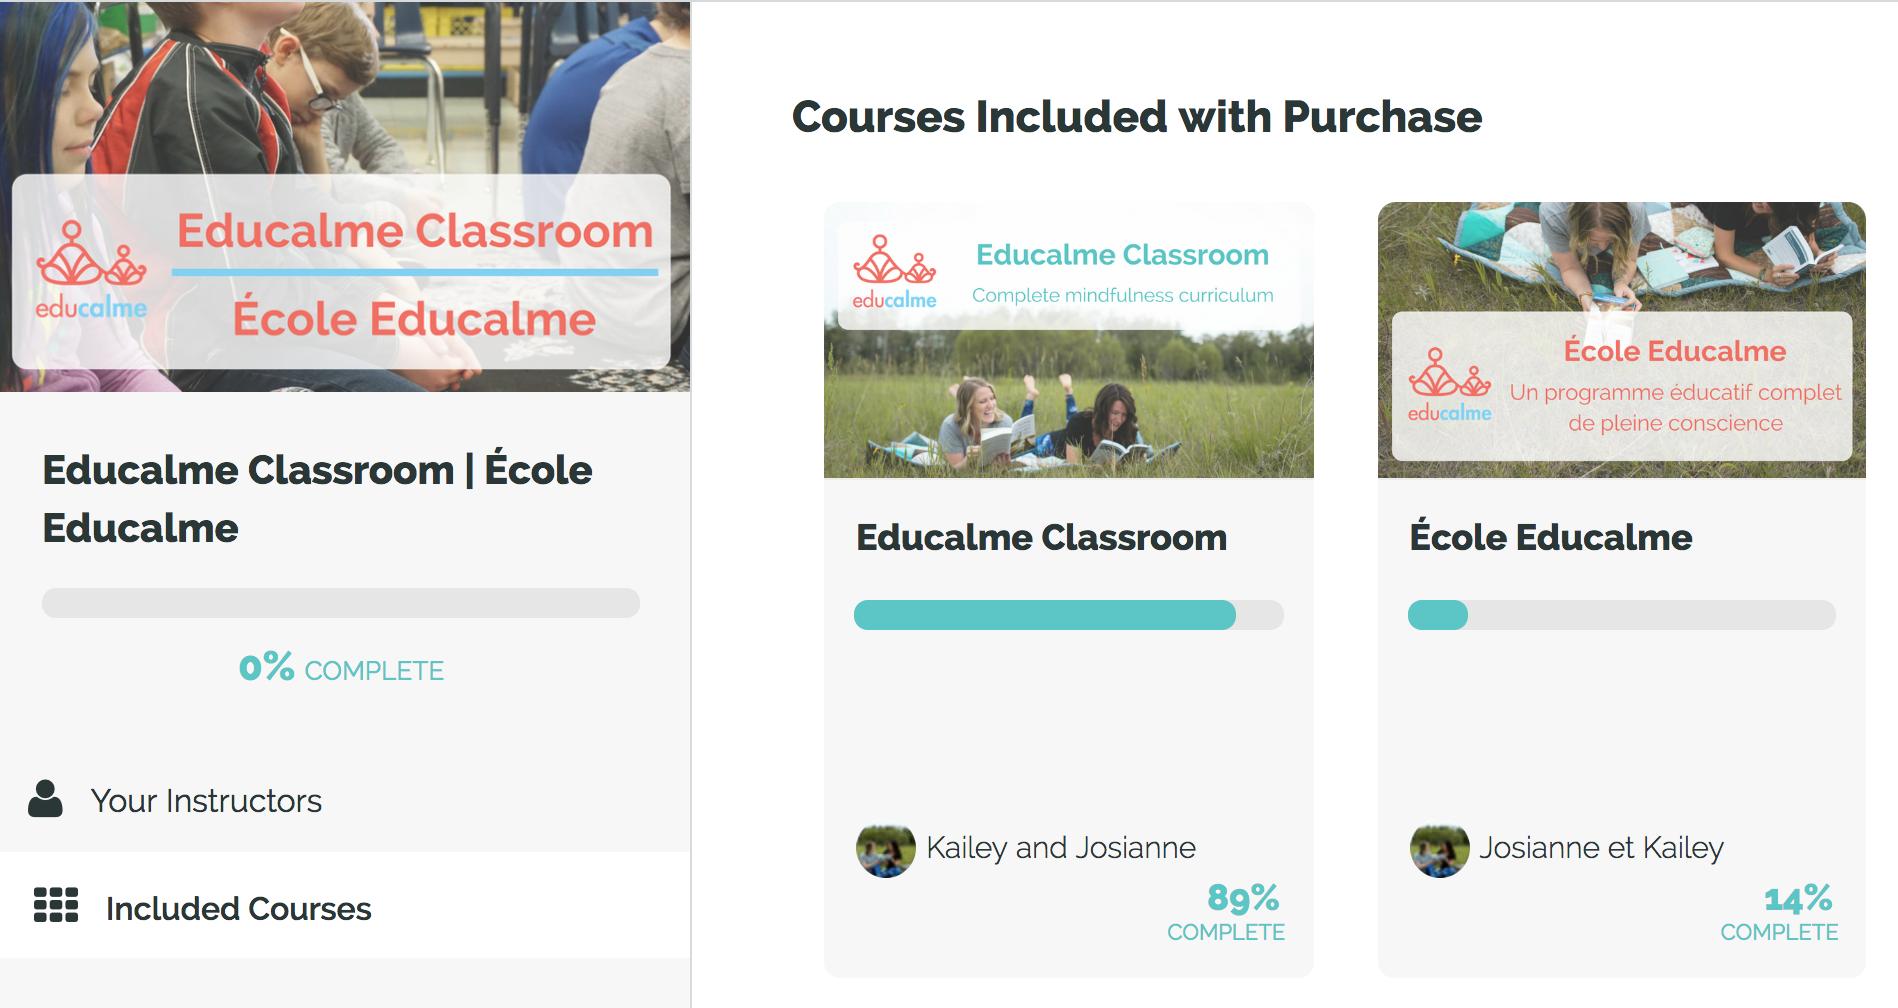 Educalme Classroom Log in View